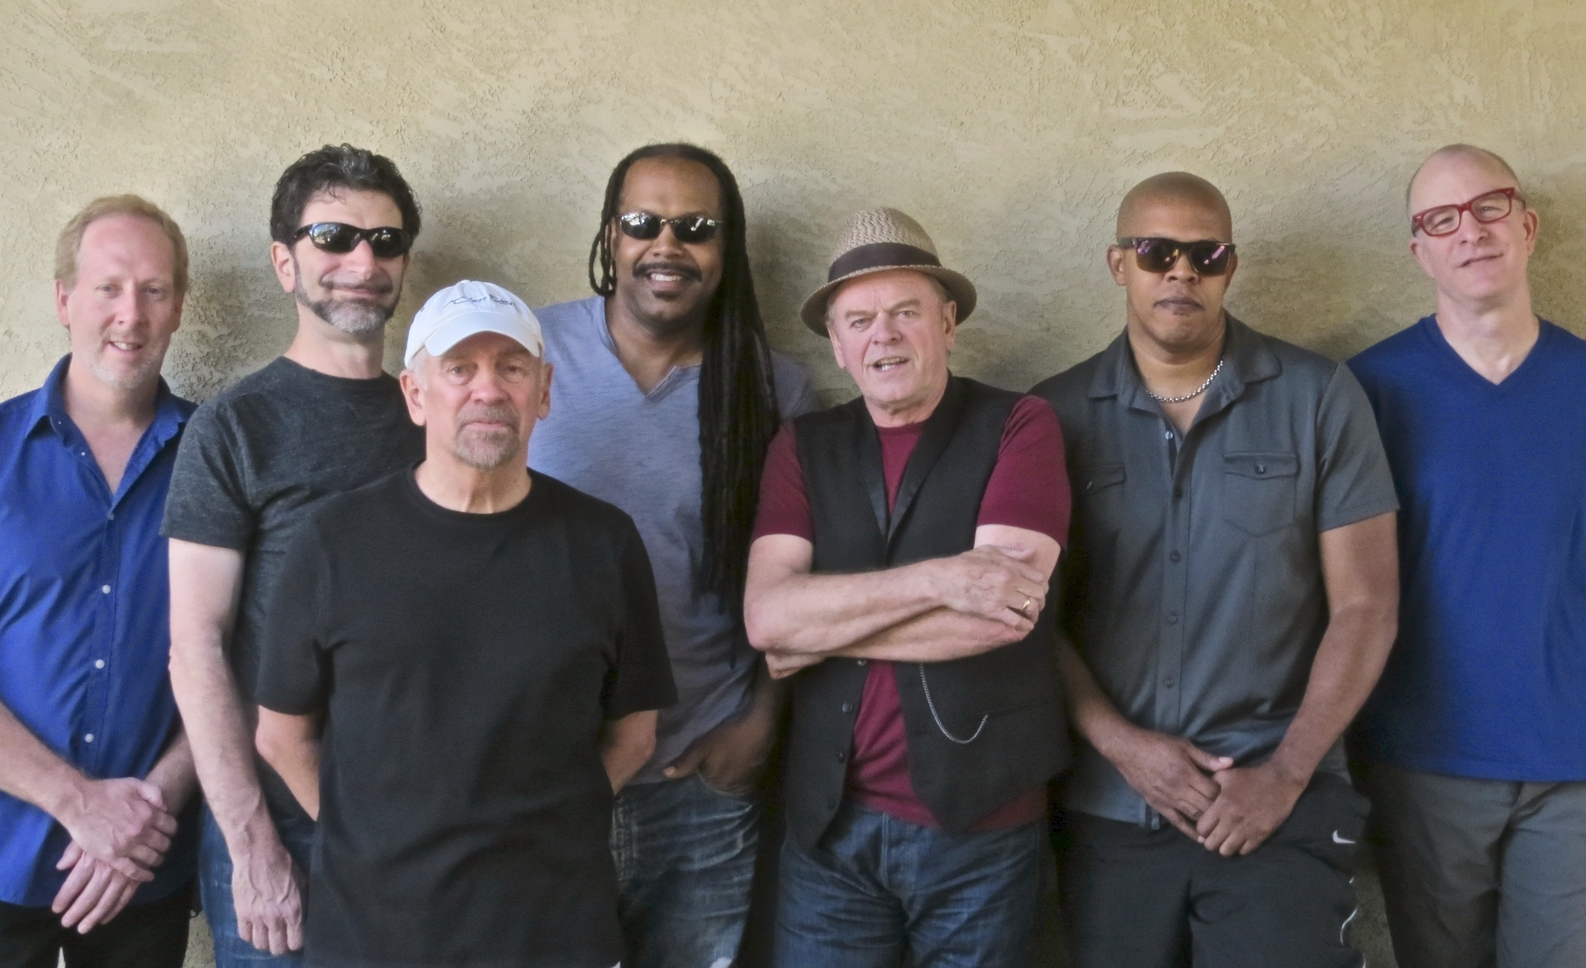 Average White Band at Paramount Hudson Valley Theater